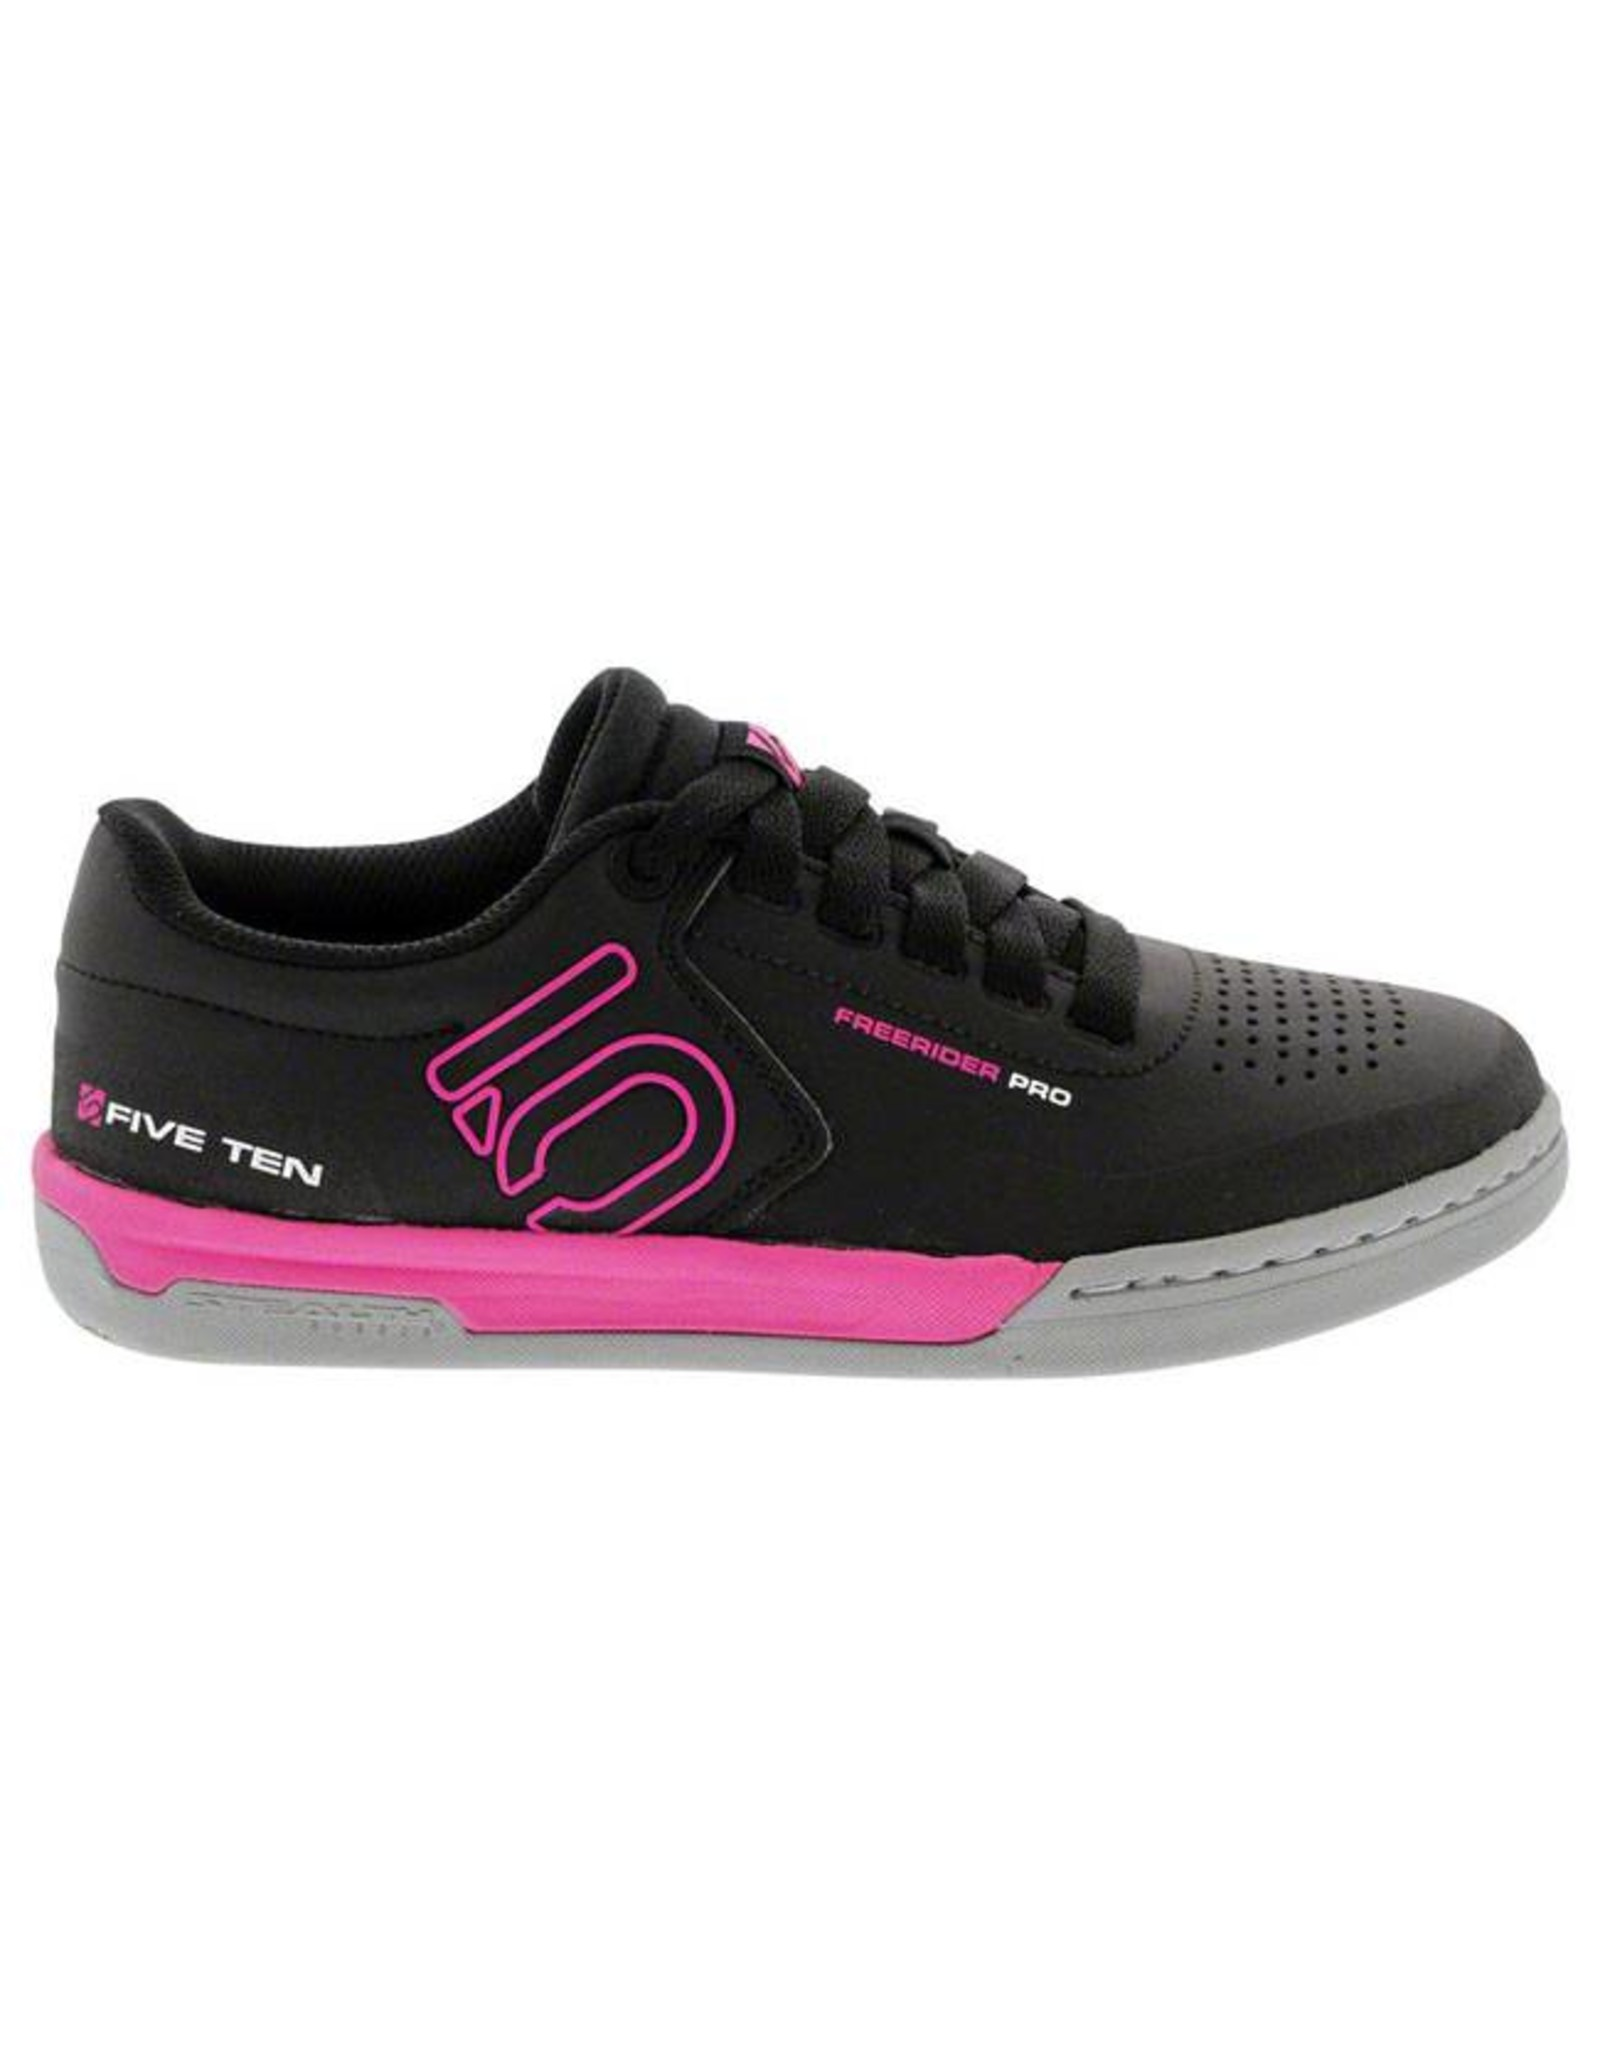 Five Ten Five Ten Freerider Pro Women's Flat Pedal Shoe: Black/Pink 7